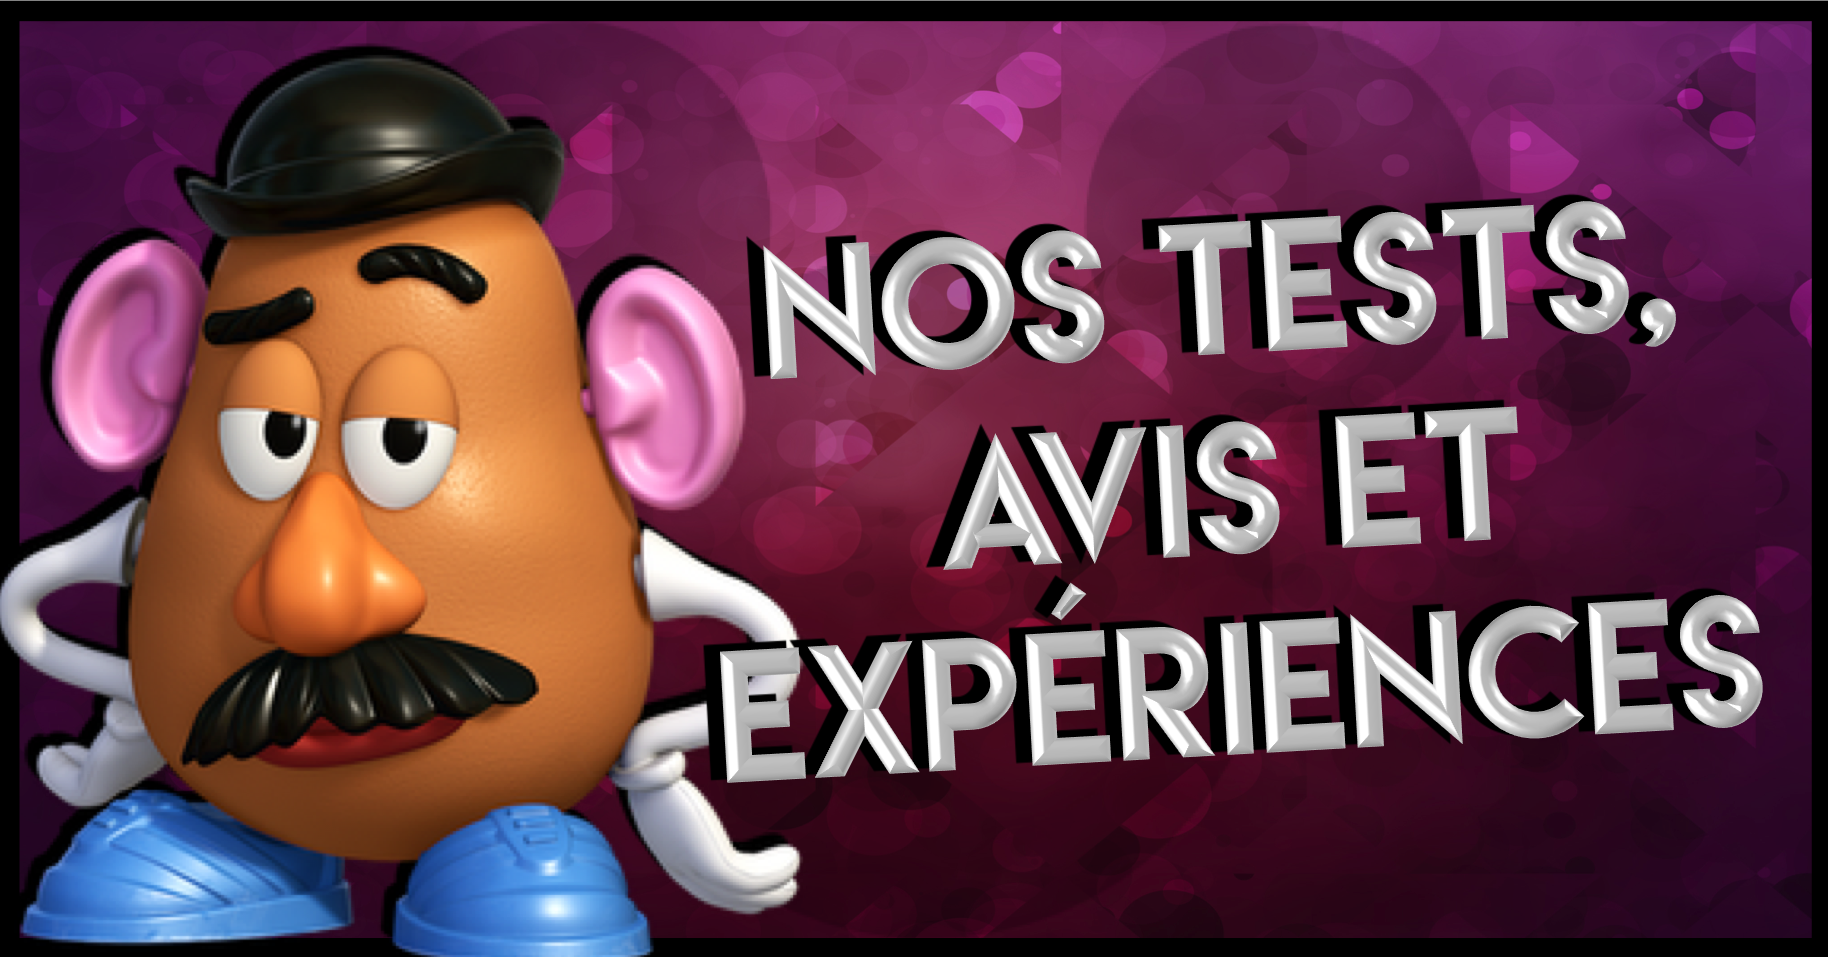 TESTSAVISETEXPERIENCES.png